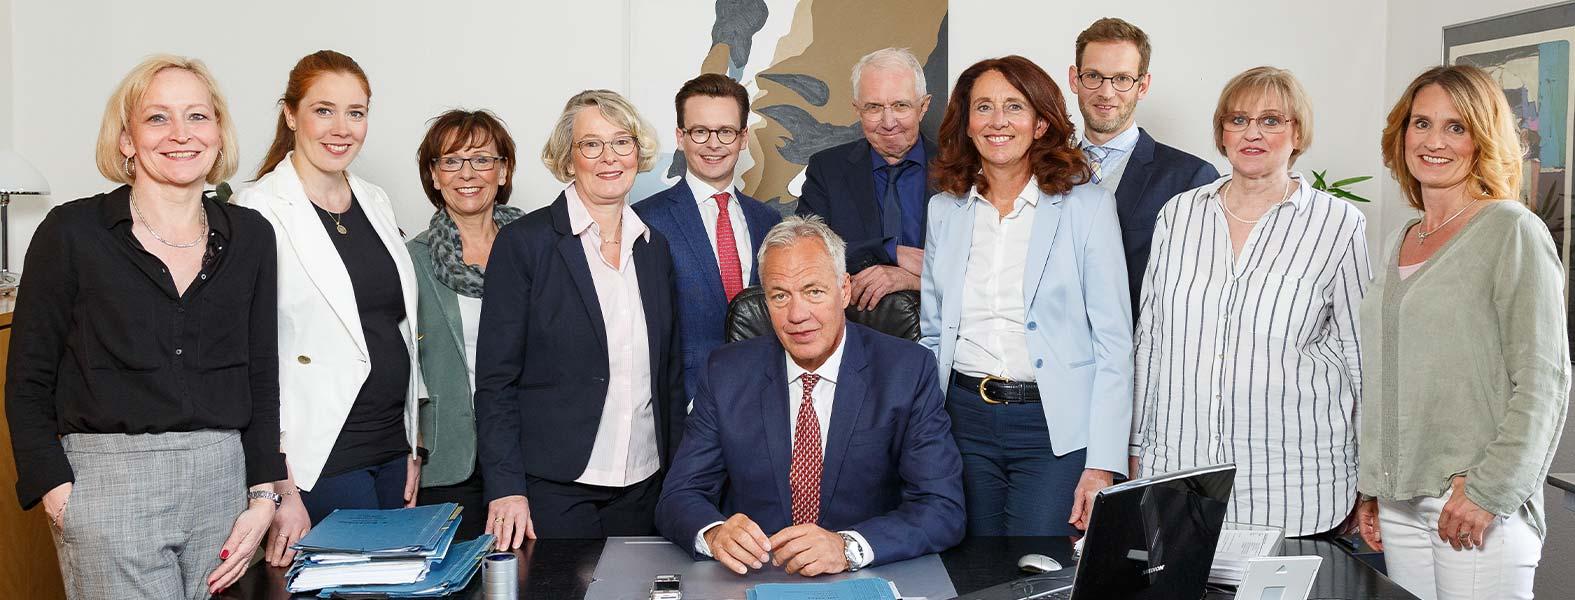 Rechtsanwaltskanzlei Brockerhoff Geiser Brockerhoff in Duisburg